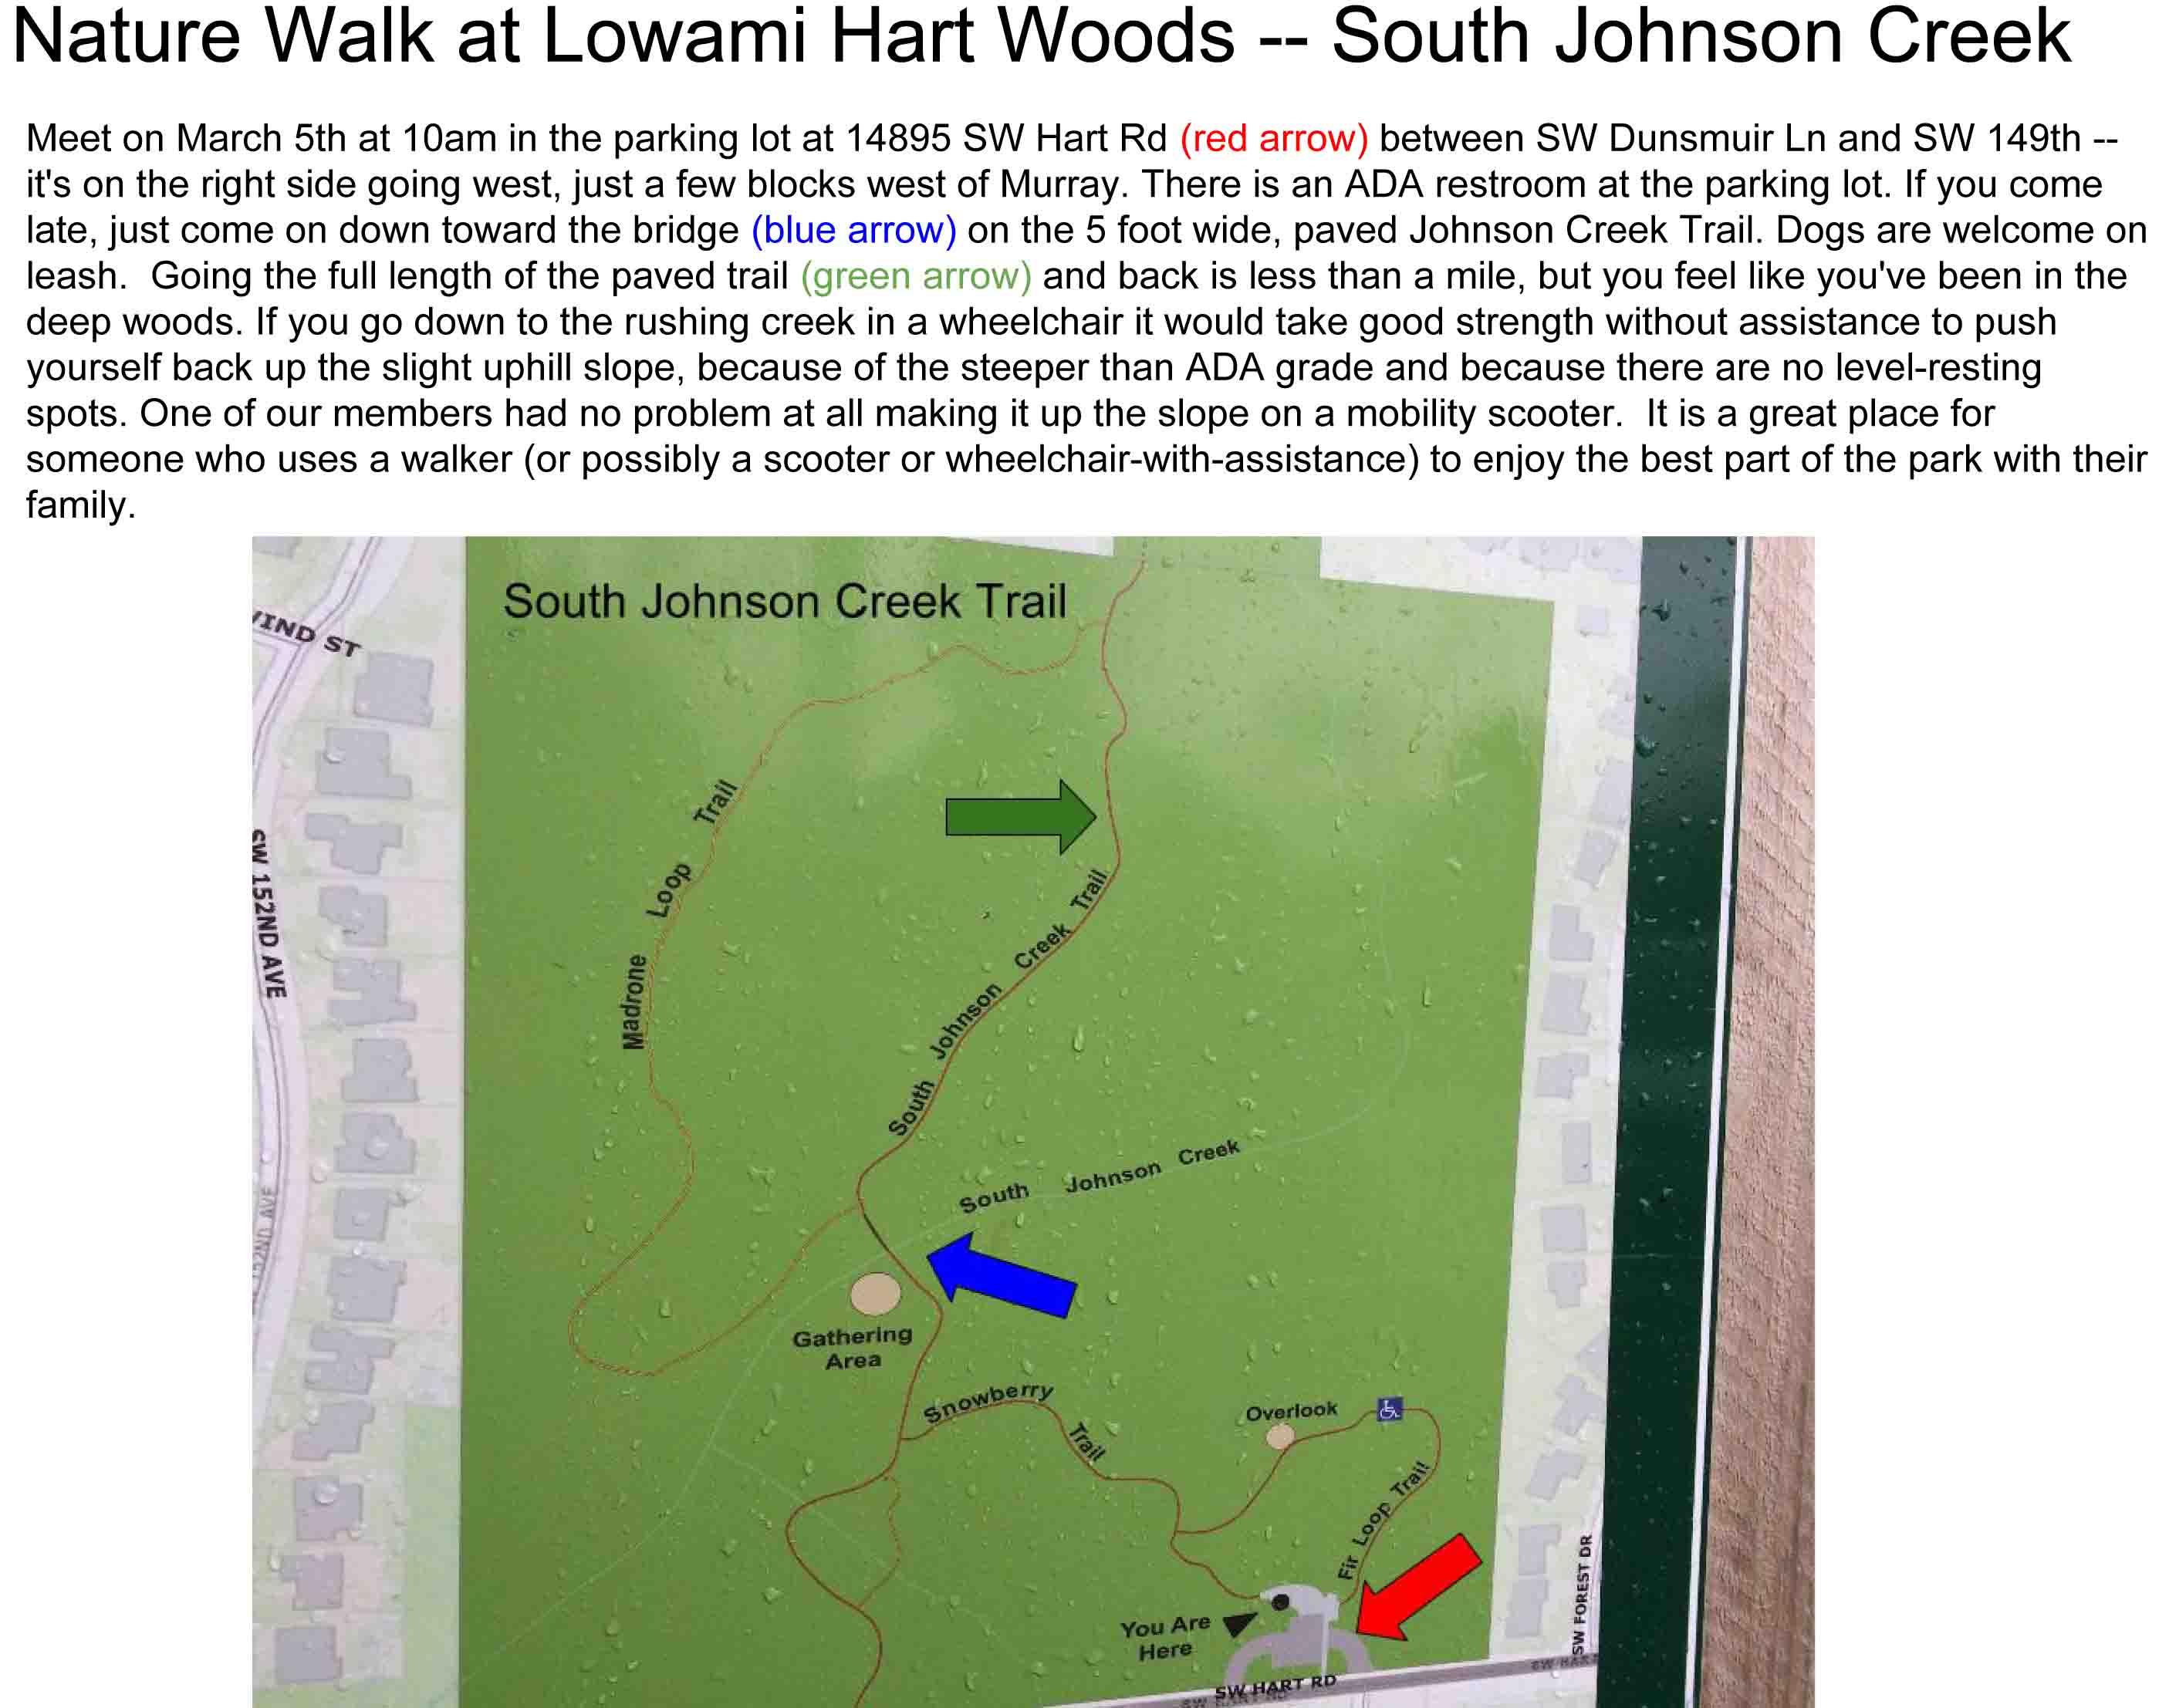 Lowami Hart Woods